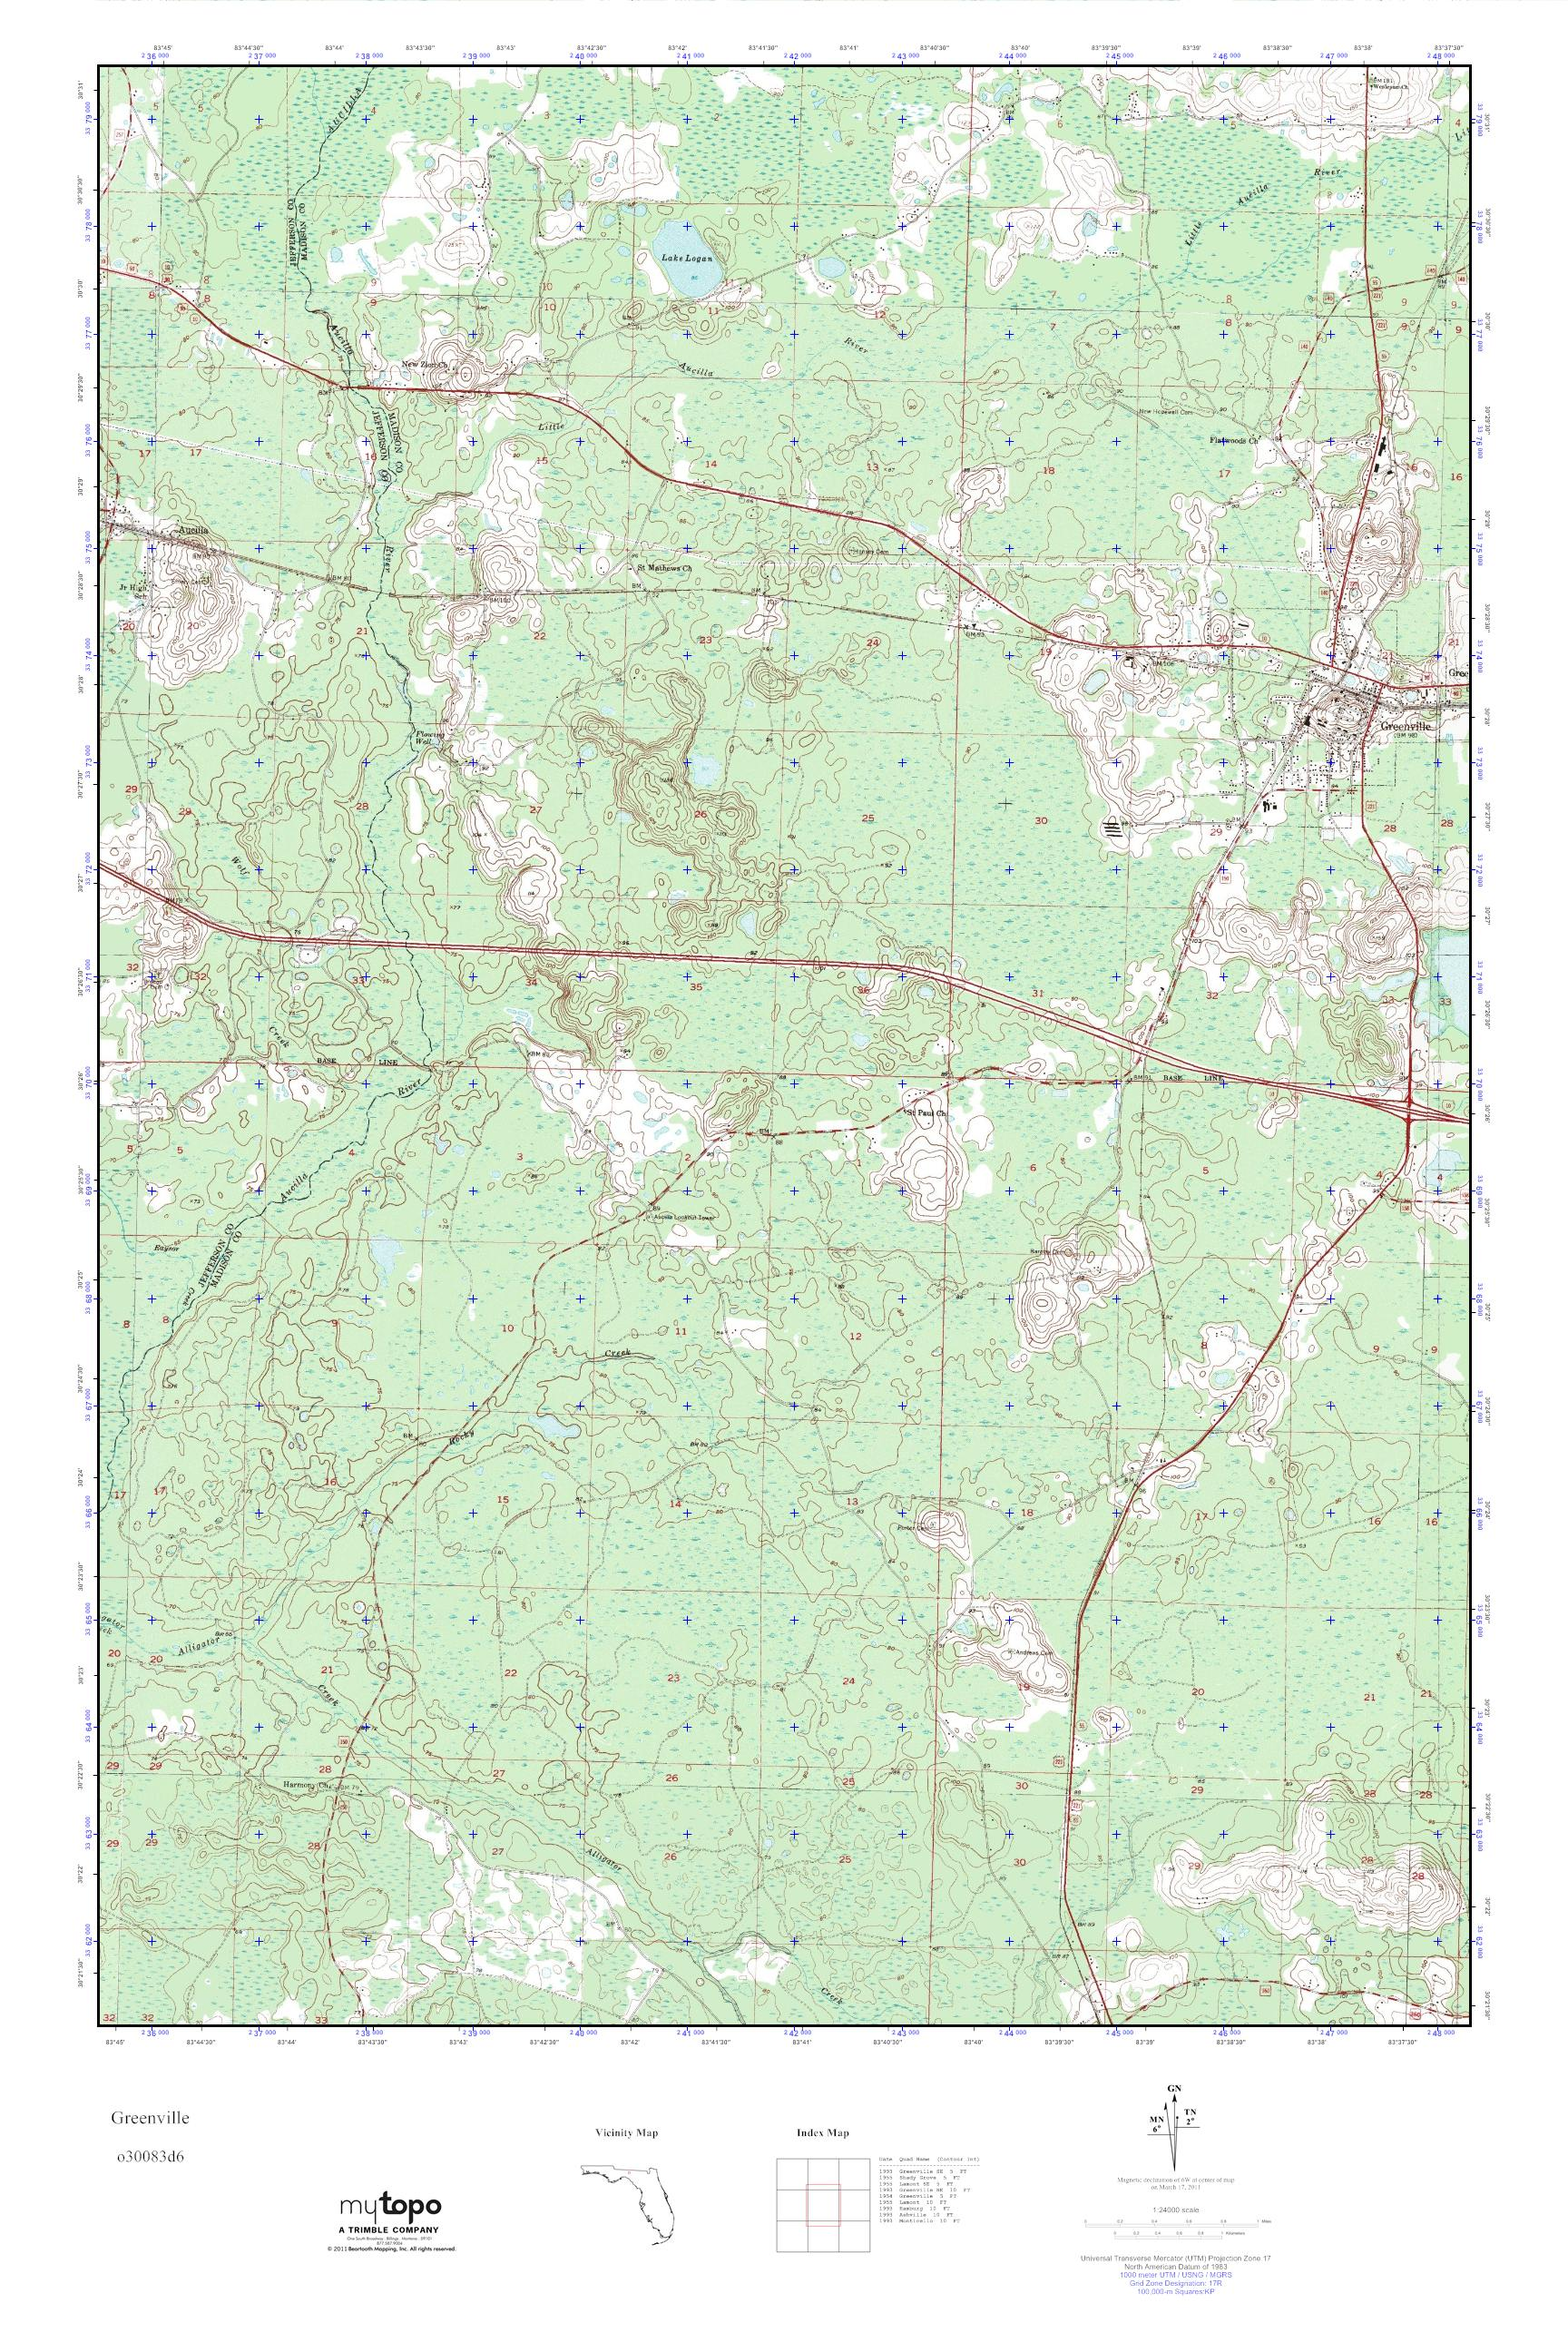 Greenville Florida Map.Mytopo Greenville Florida Usgs Quad Topo Map